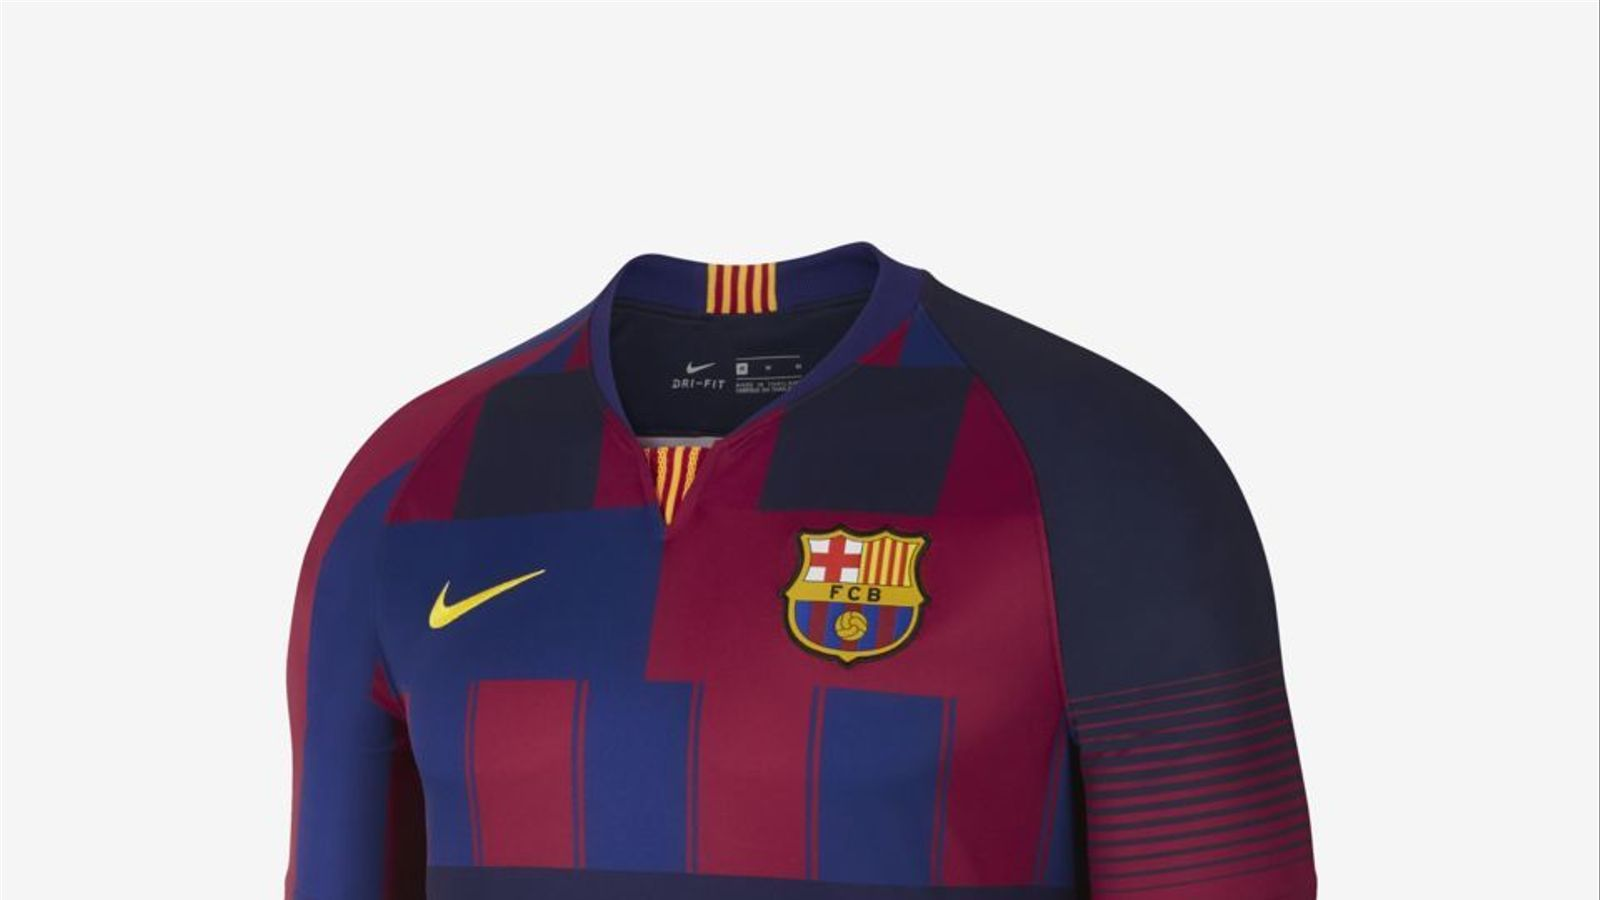 La samarreta especial de Nike